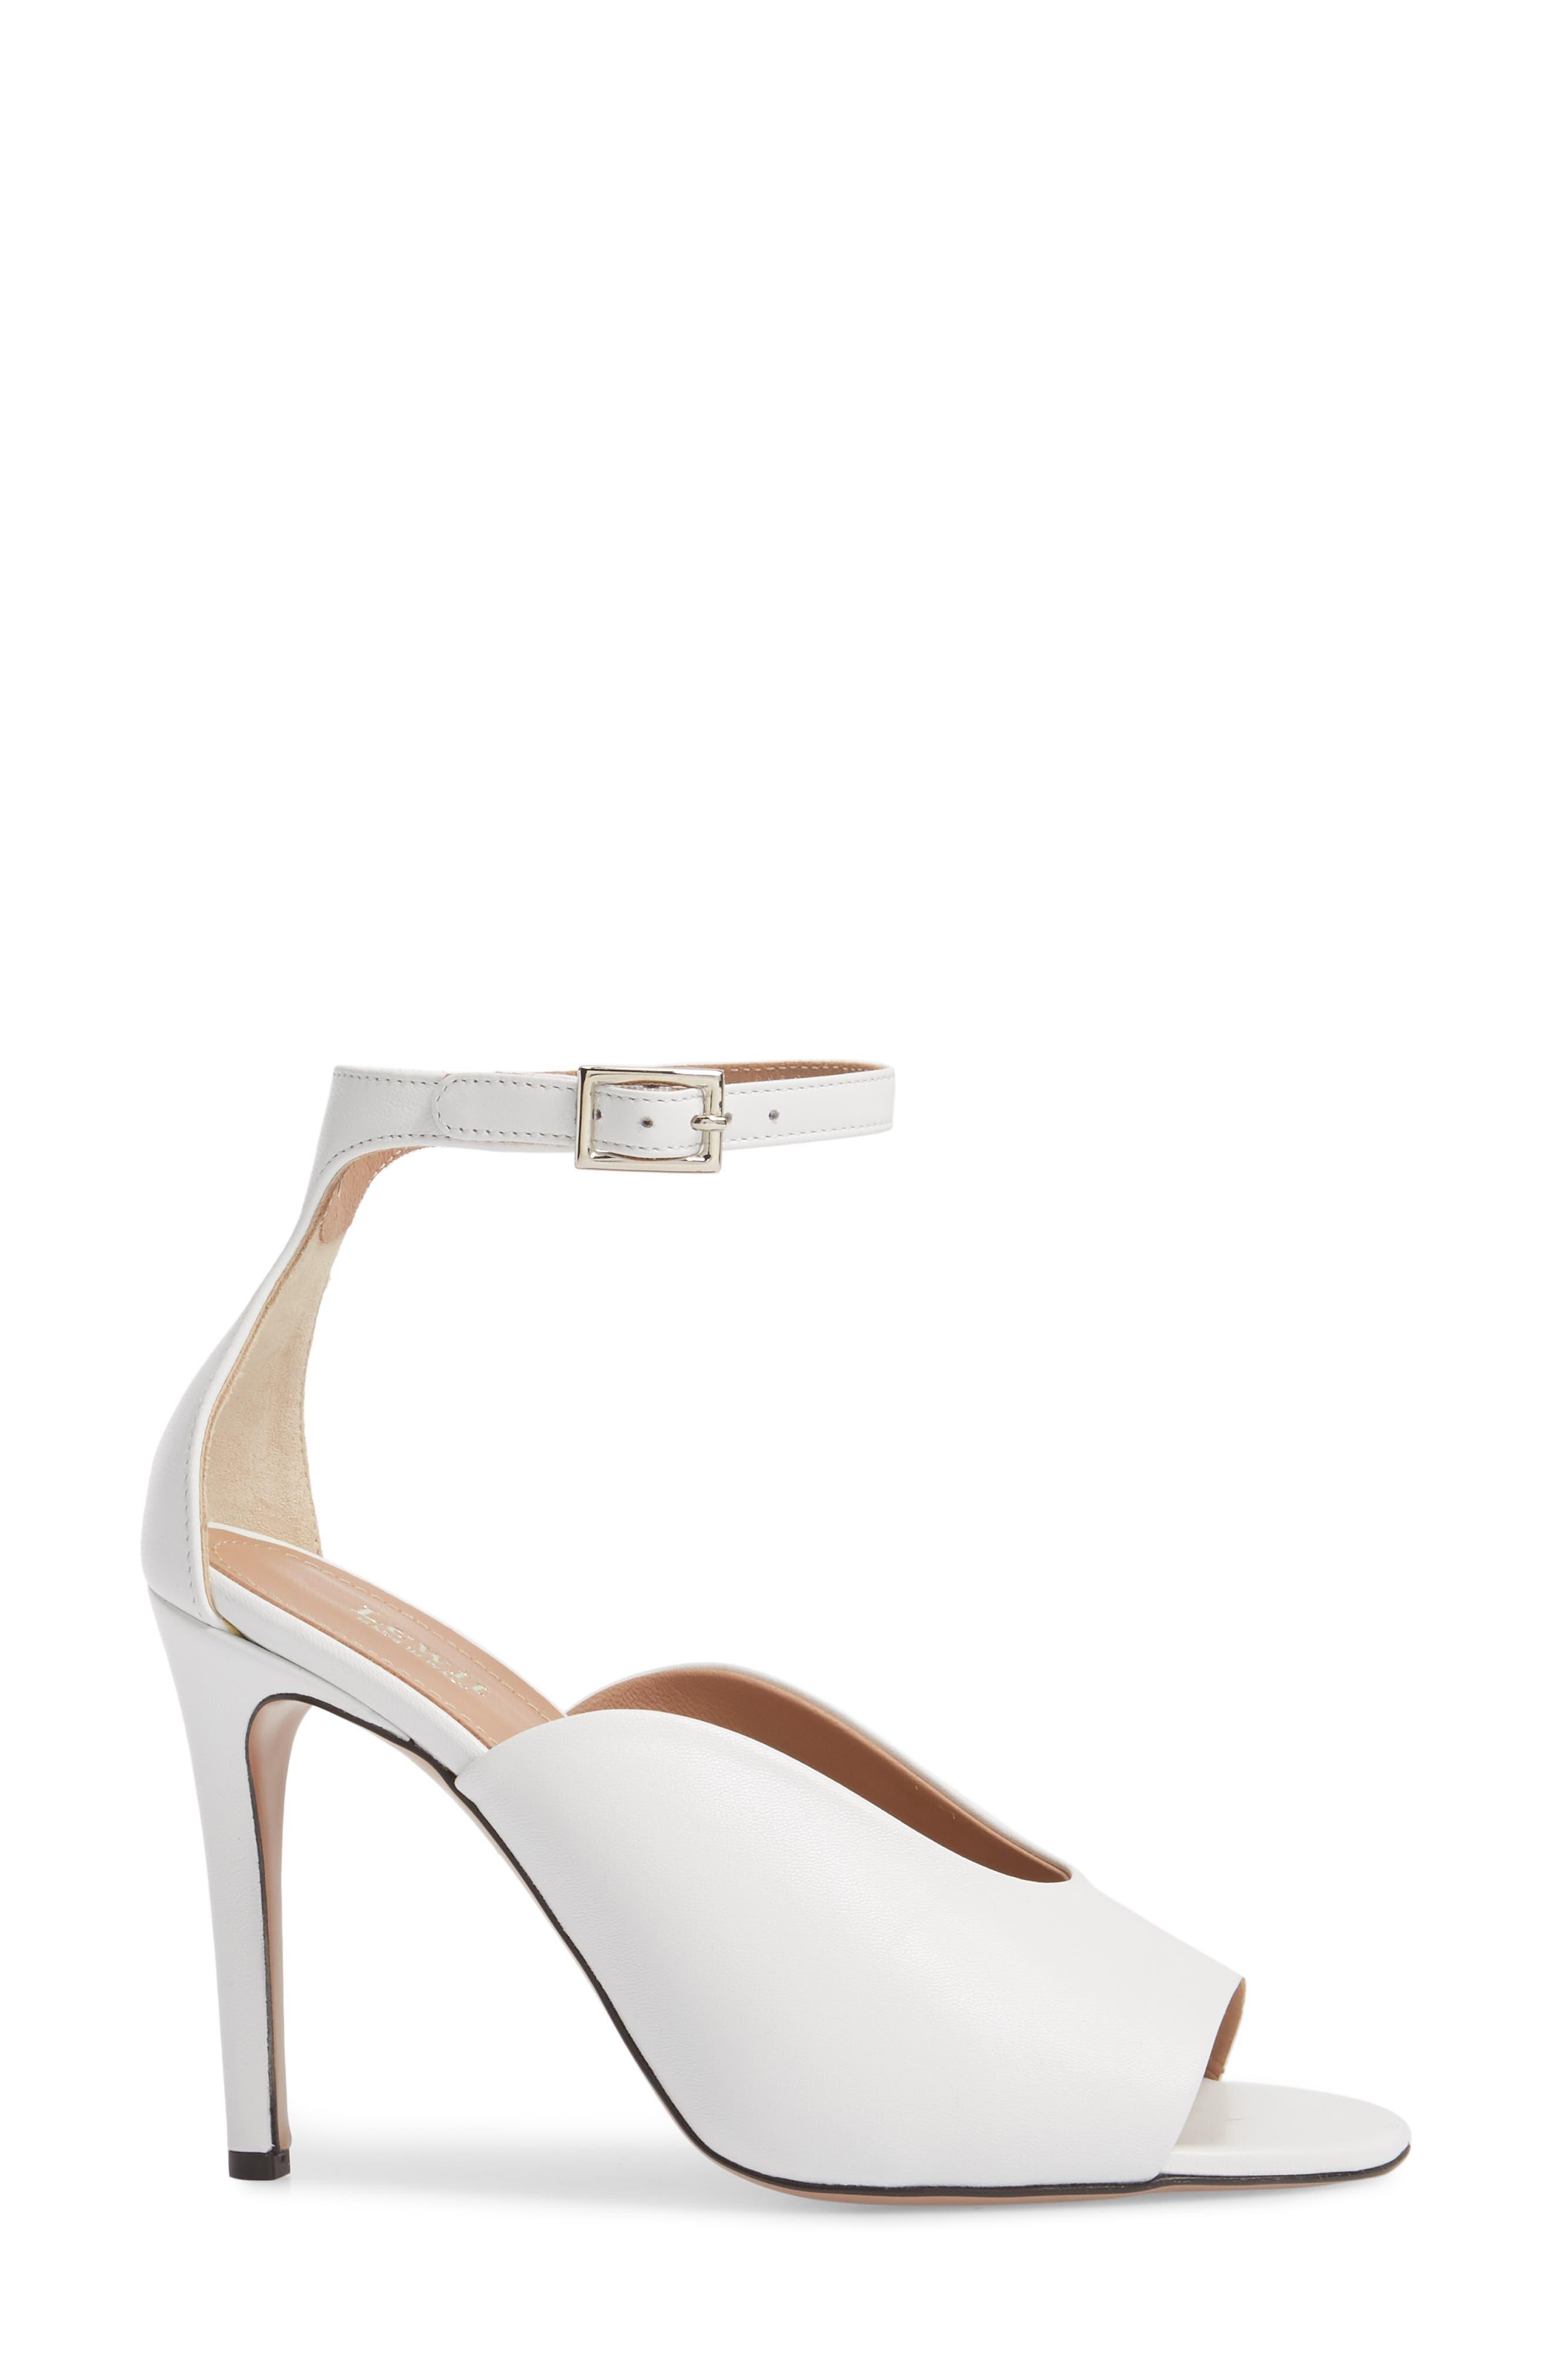 Rosalia Halo Strap Sandal,                             Alternate thumbnail 3, color,                             White Leather